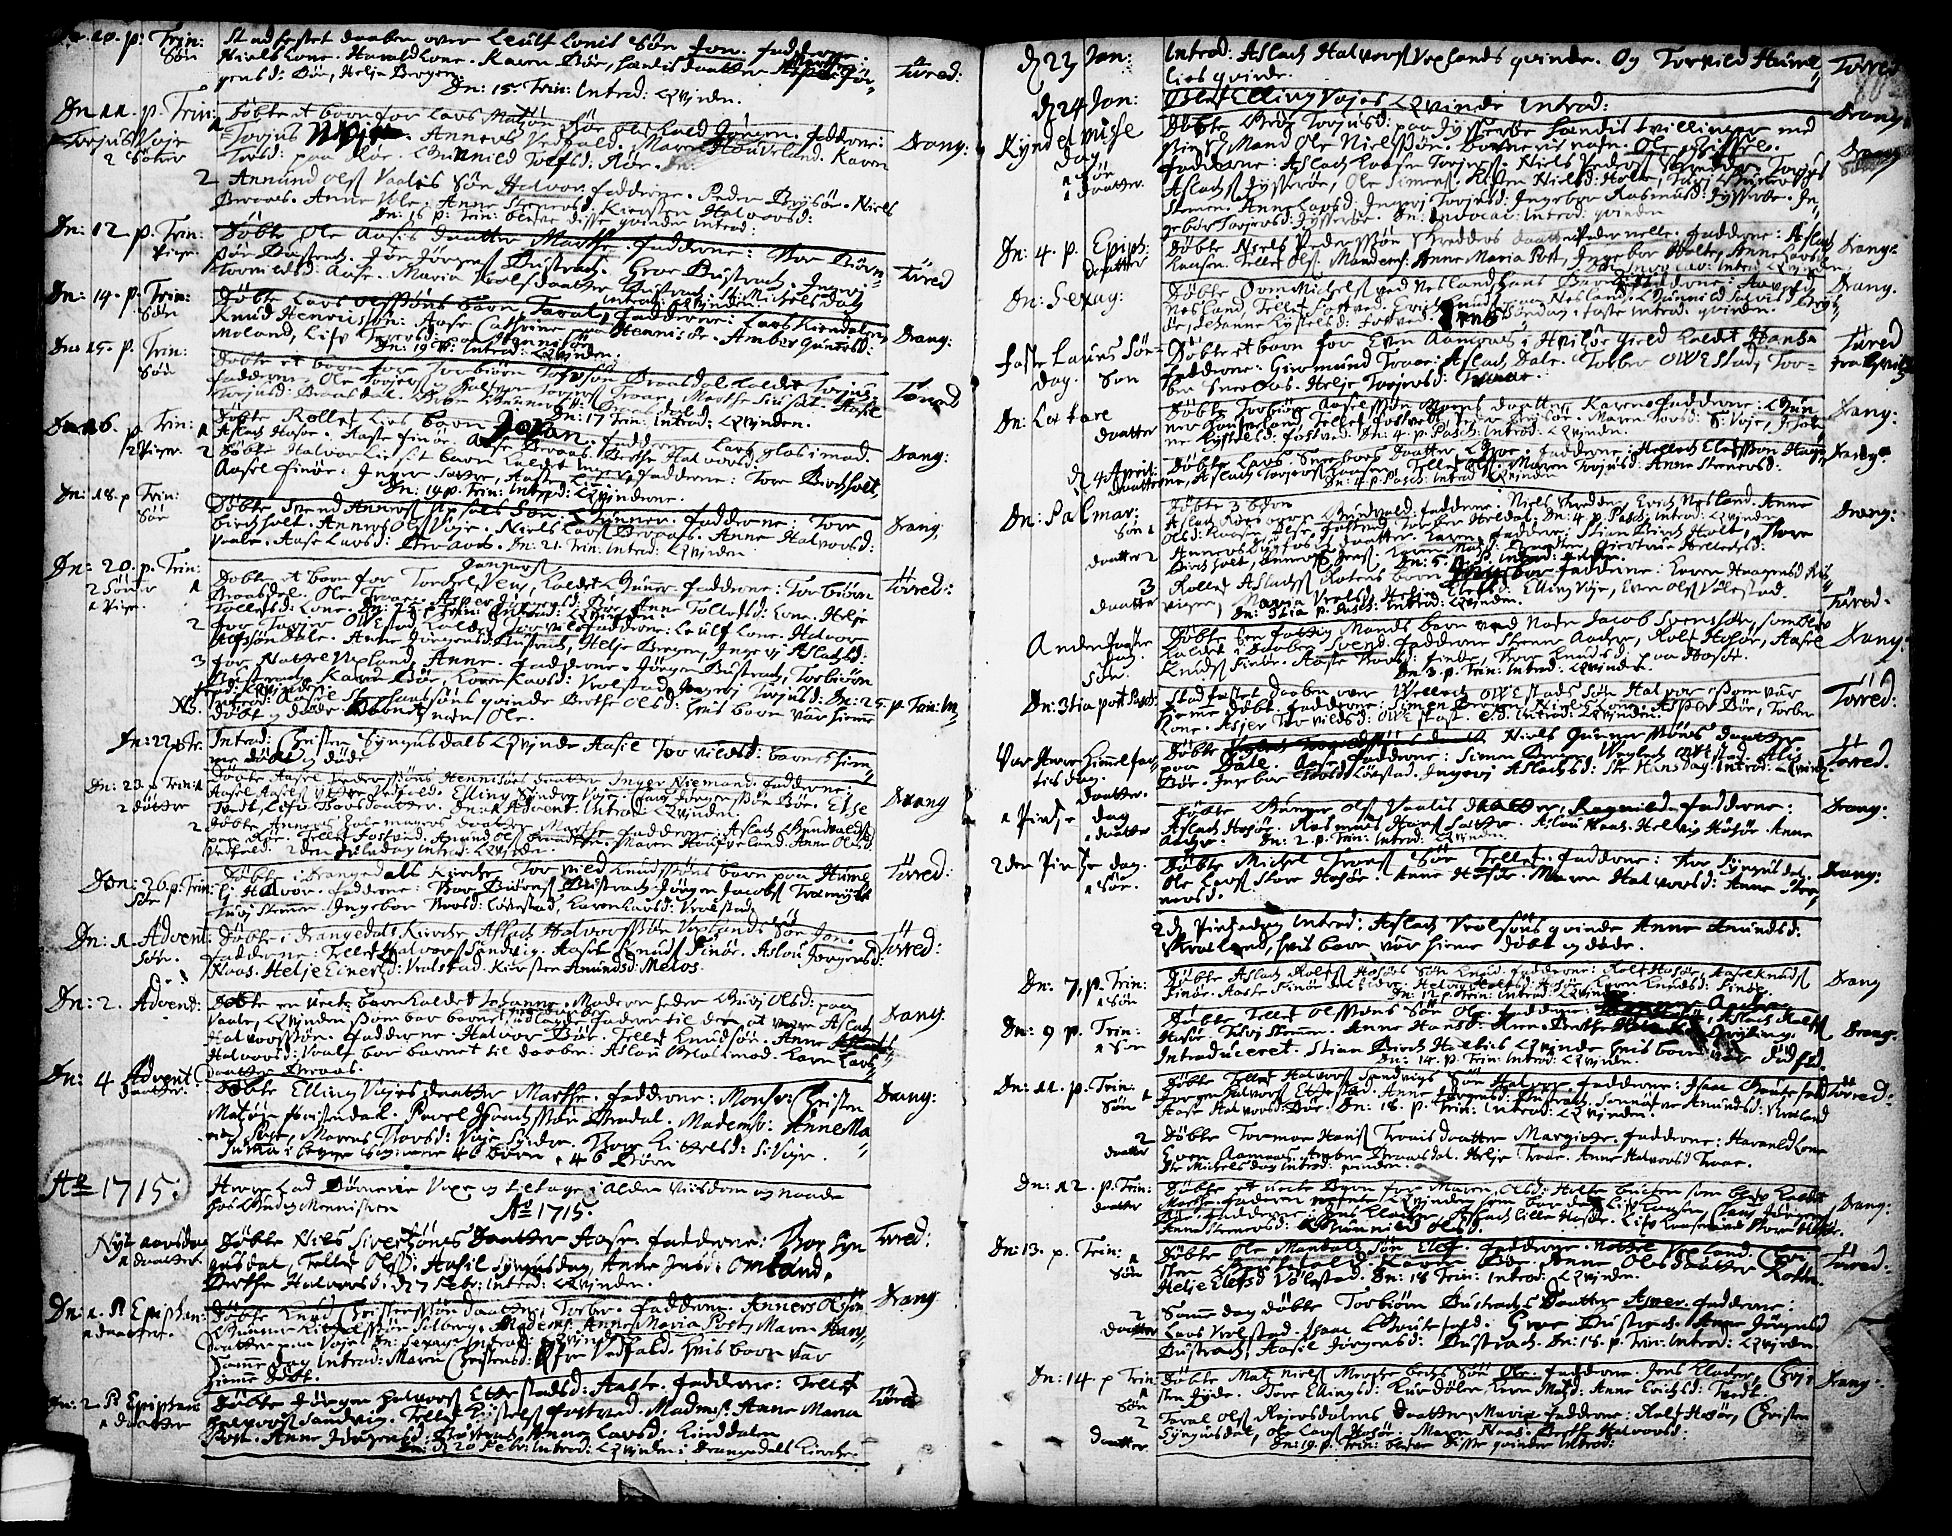 SAKO, Drangedal kirkebøker, F/Fa/L0001: Ministerialbok nr. 1, 1697-1767, s. 80